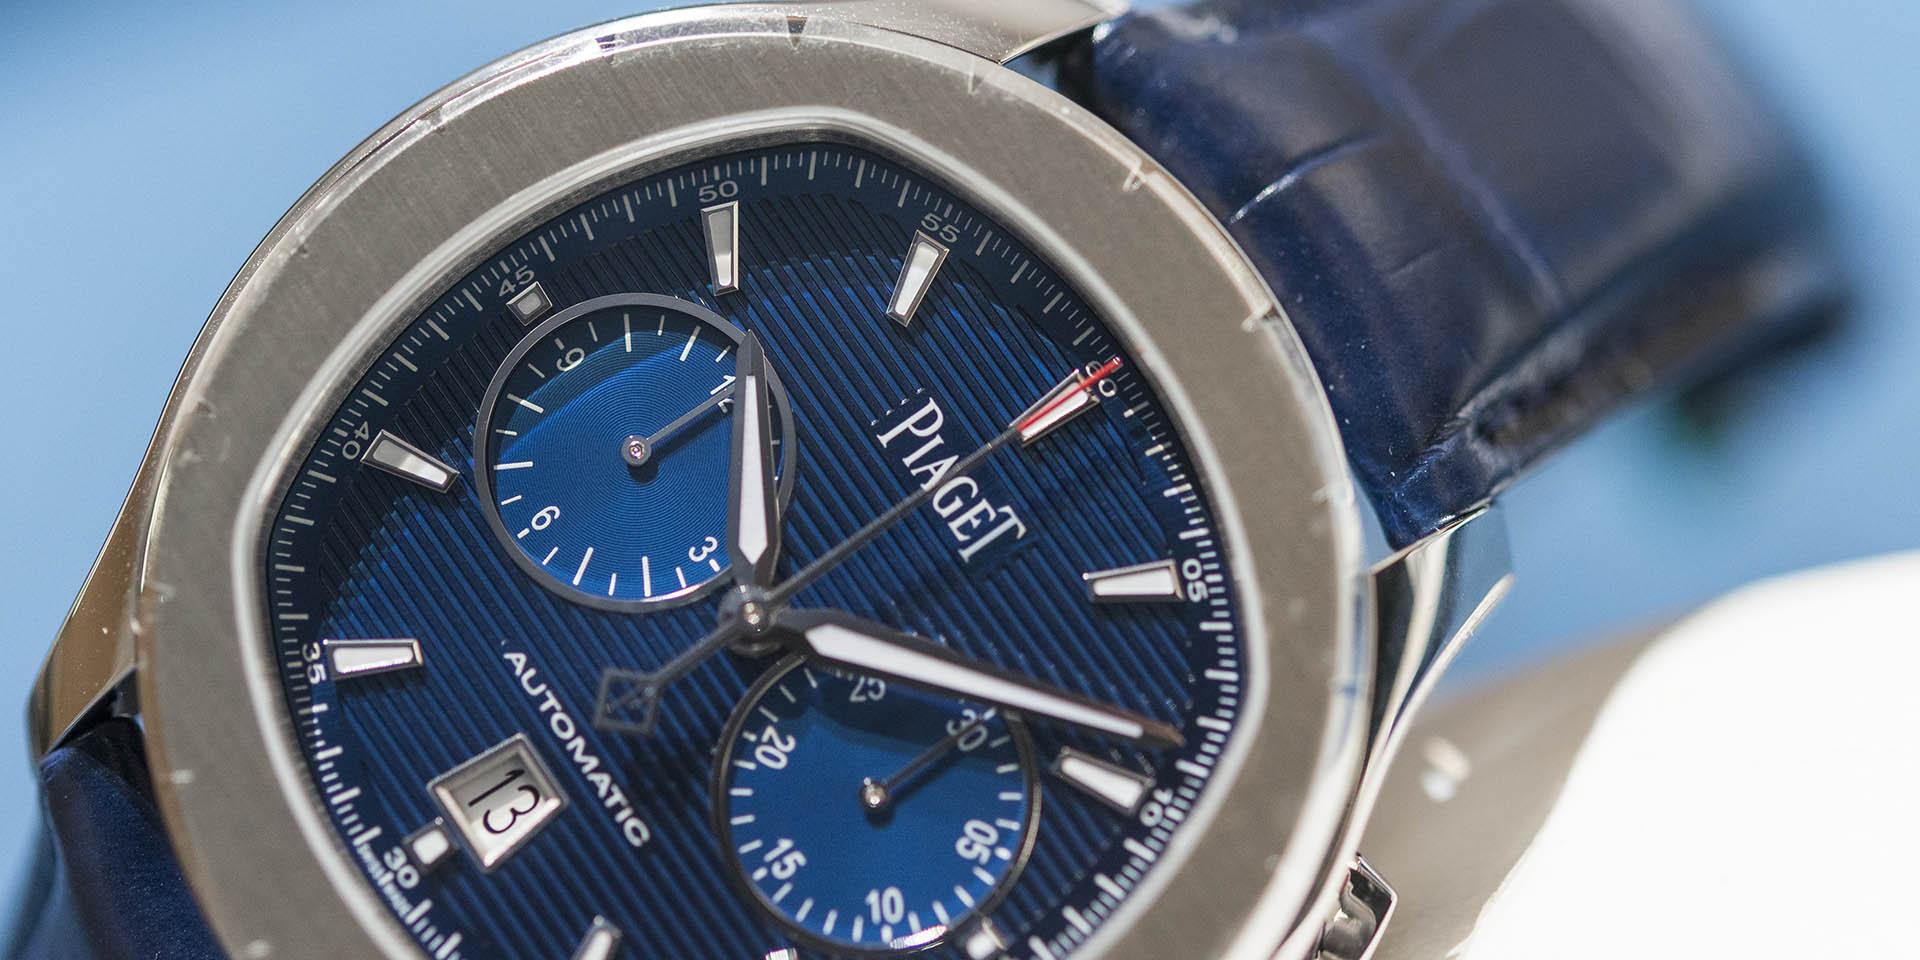 piaget-polo-s-chronograph-sihh-2018-3.jpg